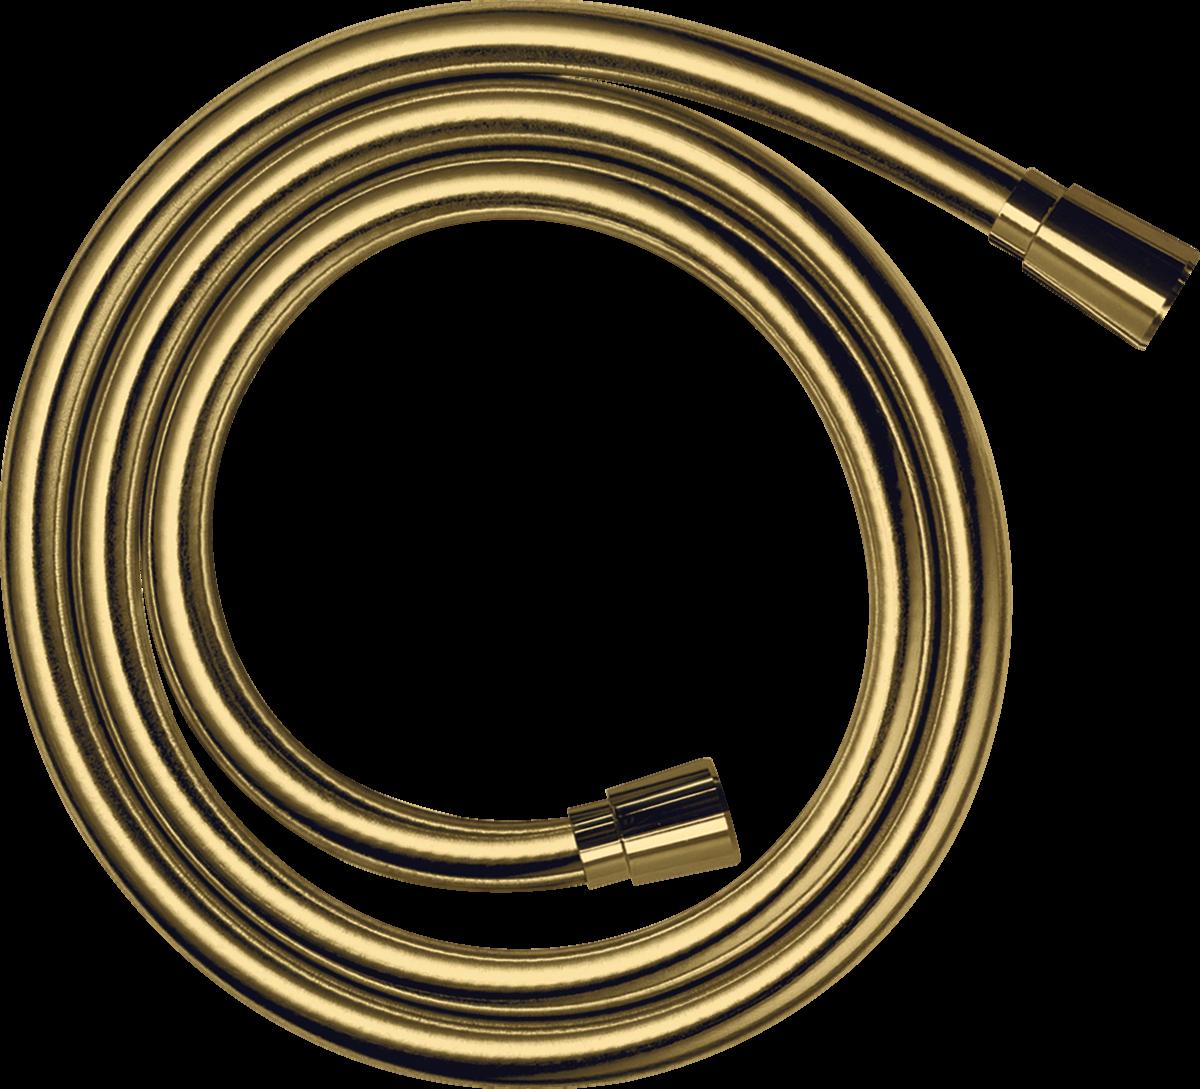 Flexible de douche Hansgrohe Isiflex 1,25 m aspect doré poli